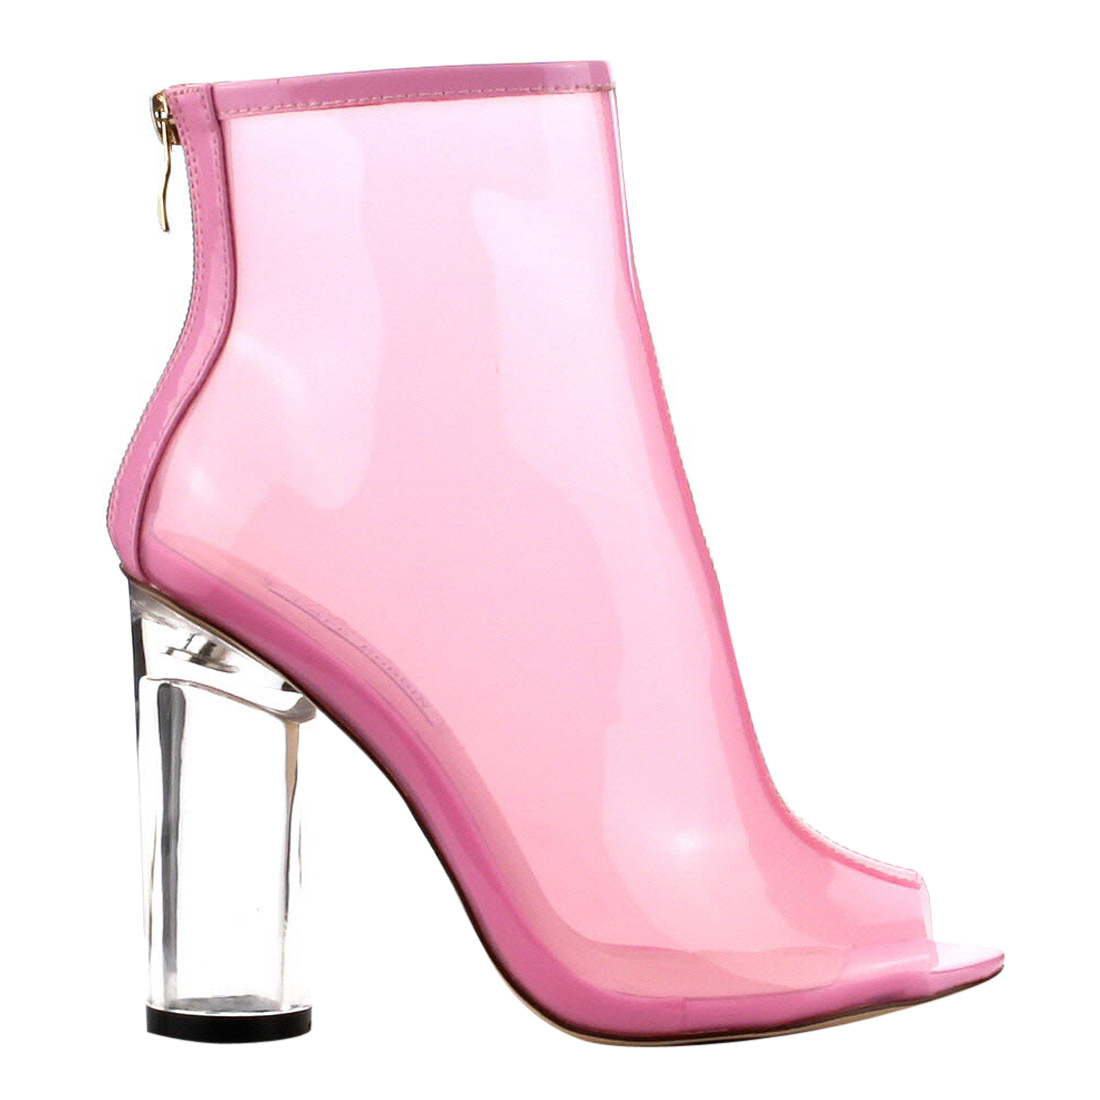 1a3a8648e34 Cape Robbin - CAPE ROBBIN FF66 Women s Peep Toe Block Clear Perspex Heel  Ankle Booties - Walmart.com